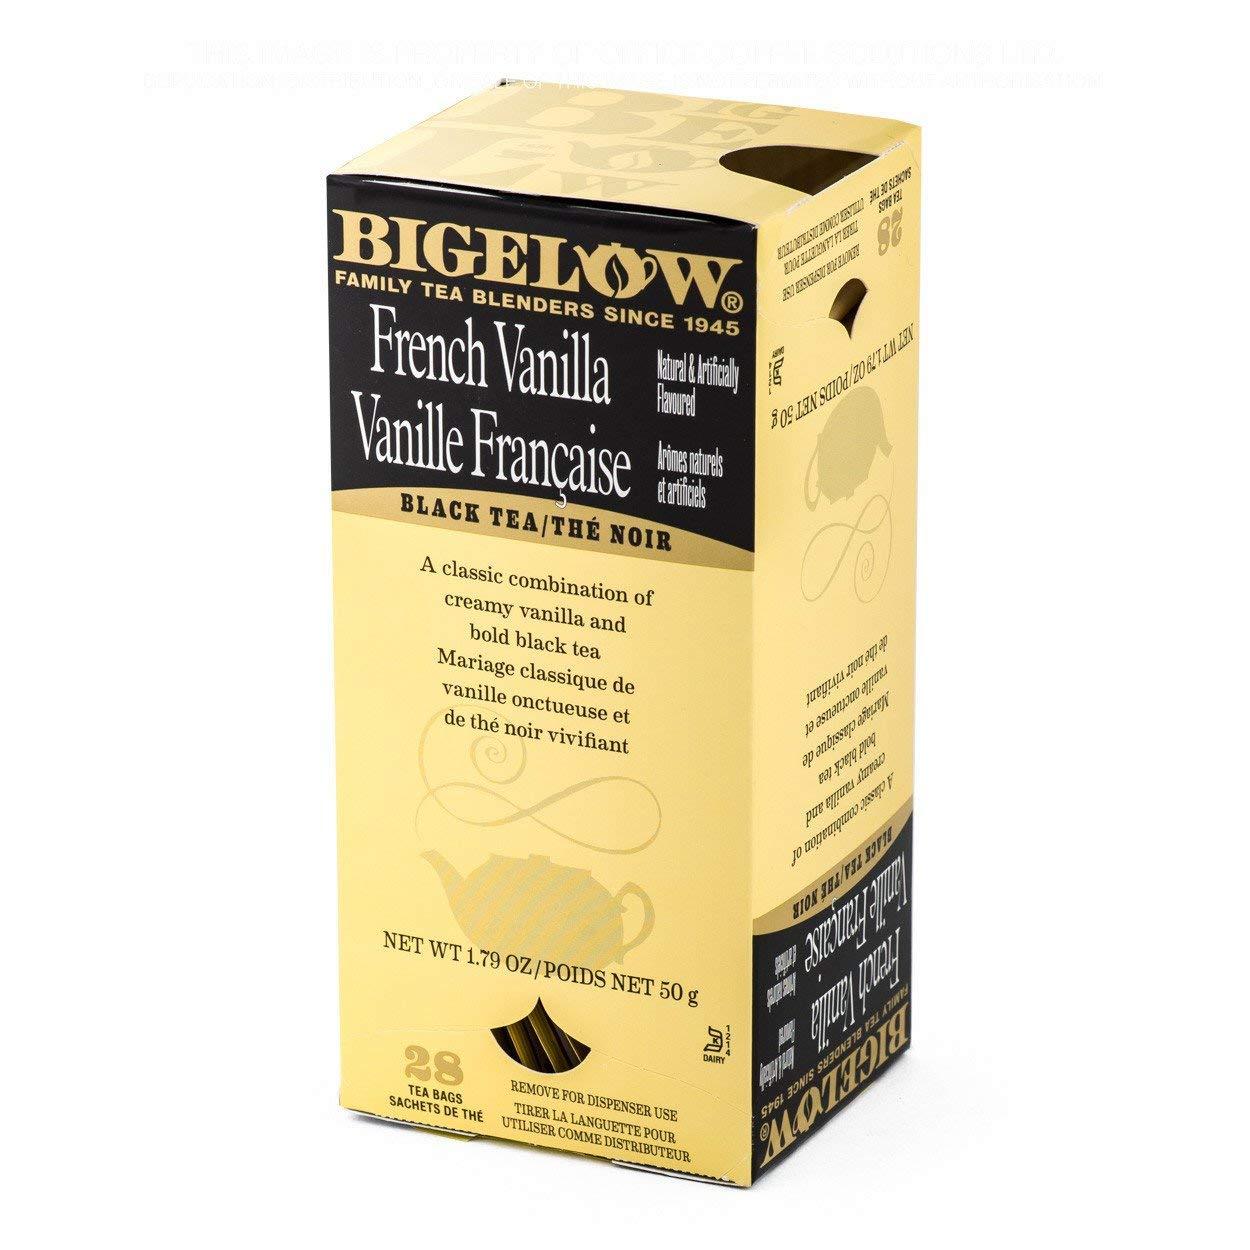 Bigelow French Vanilla Tea 28-Count Box (Pack of 1) Premium Black Tea Flavored with Vanilla Antioxidant-Rich Gluten-Free Full-Caffeine Tea